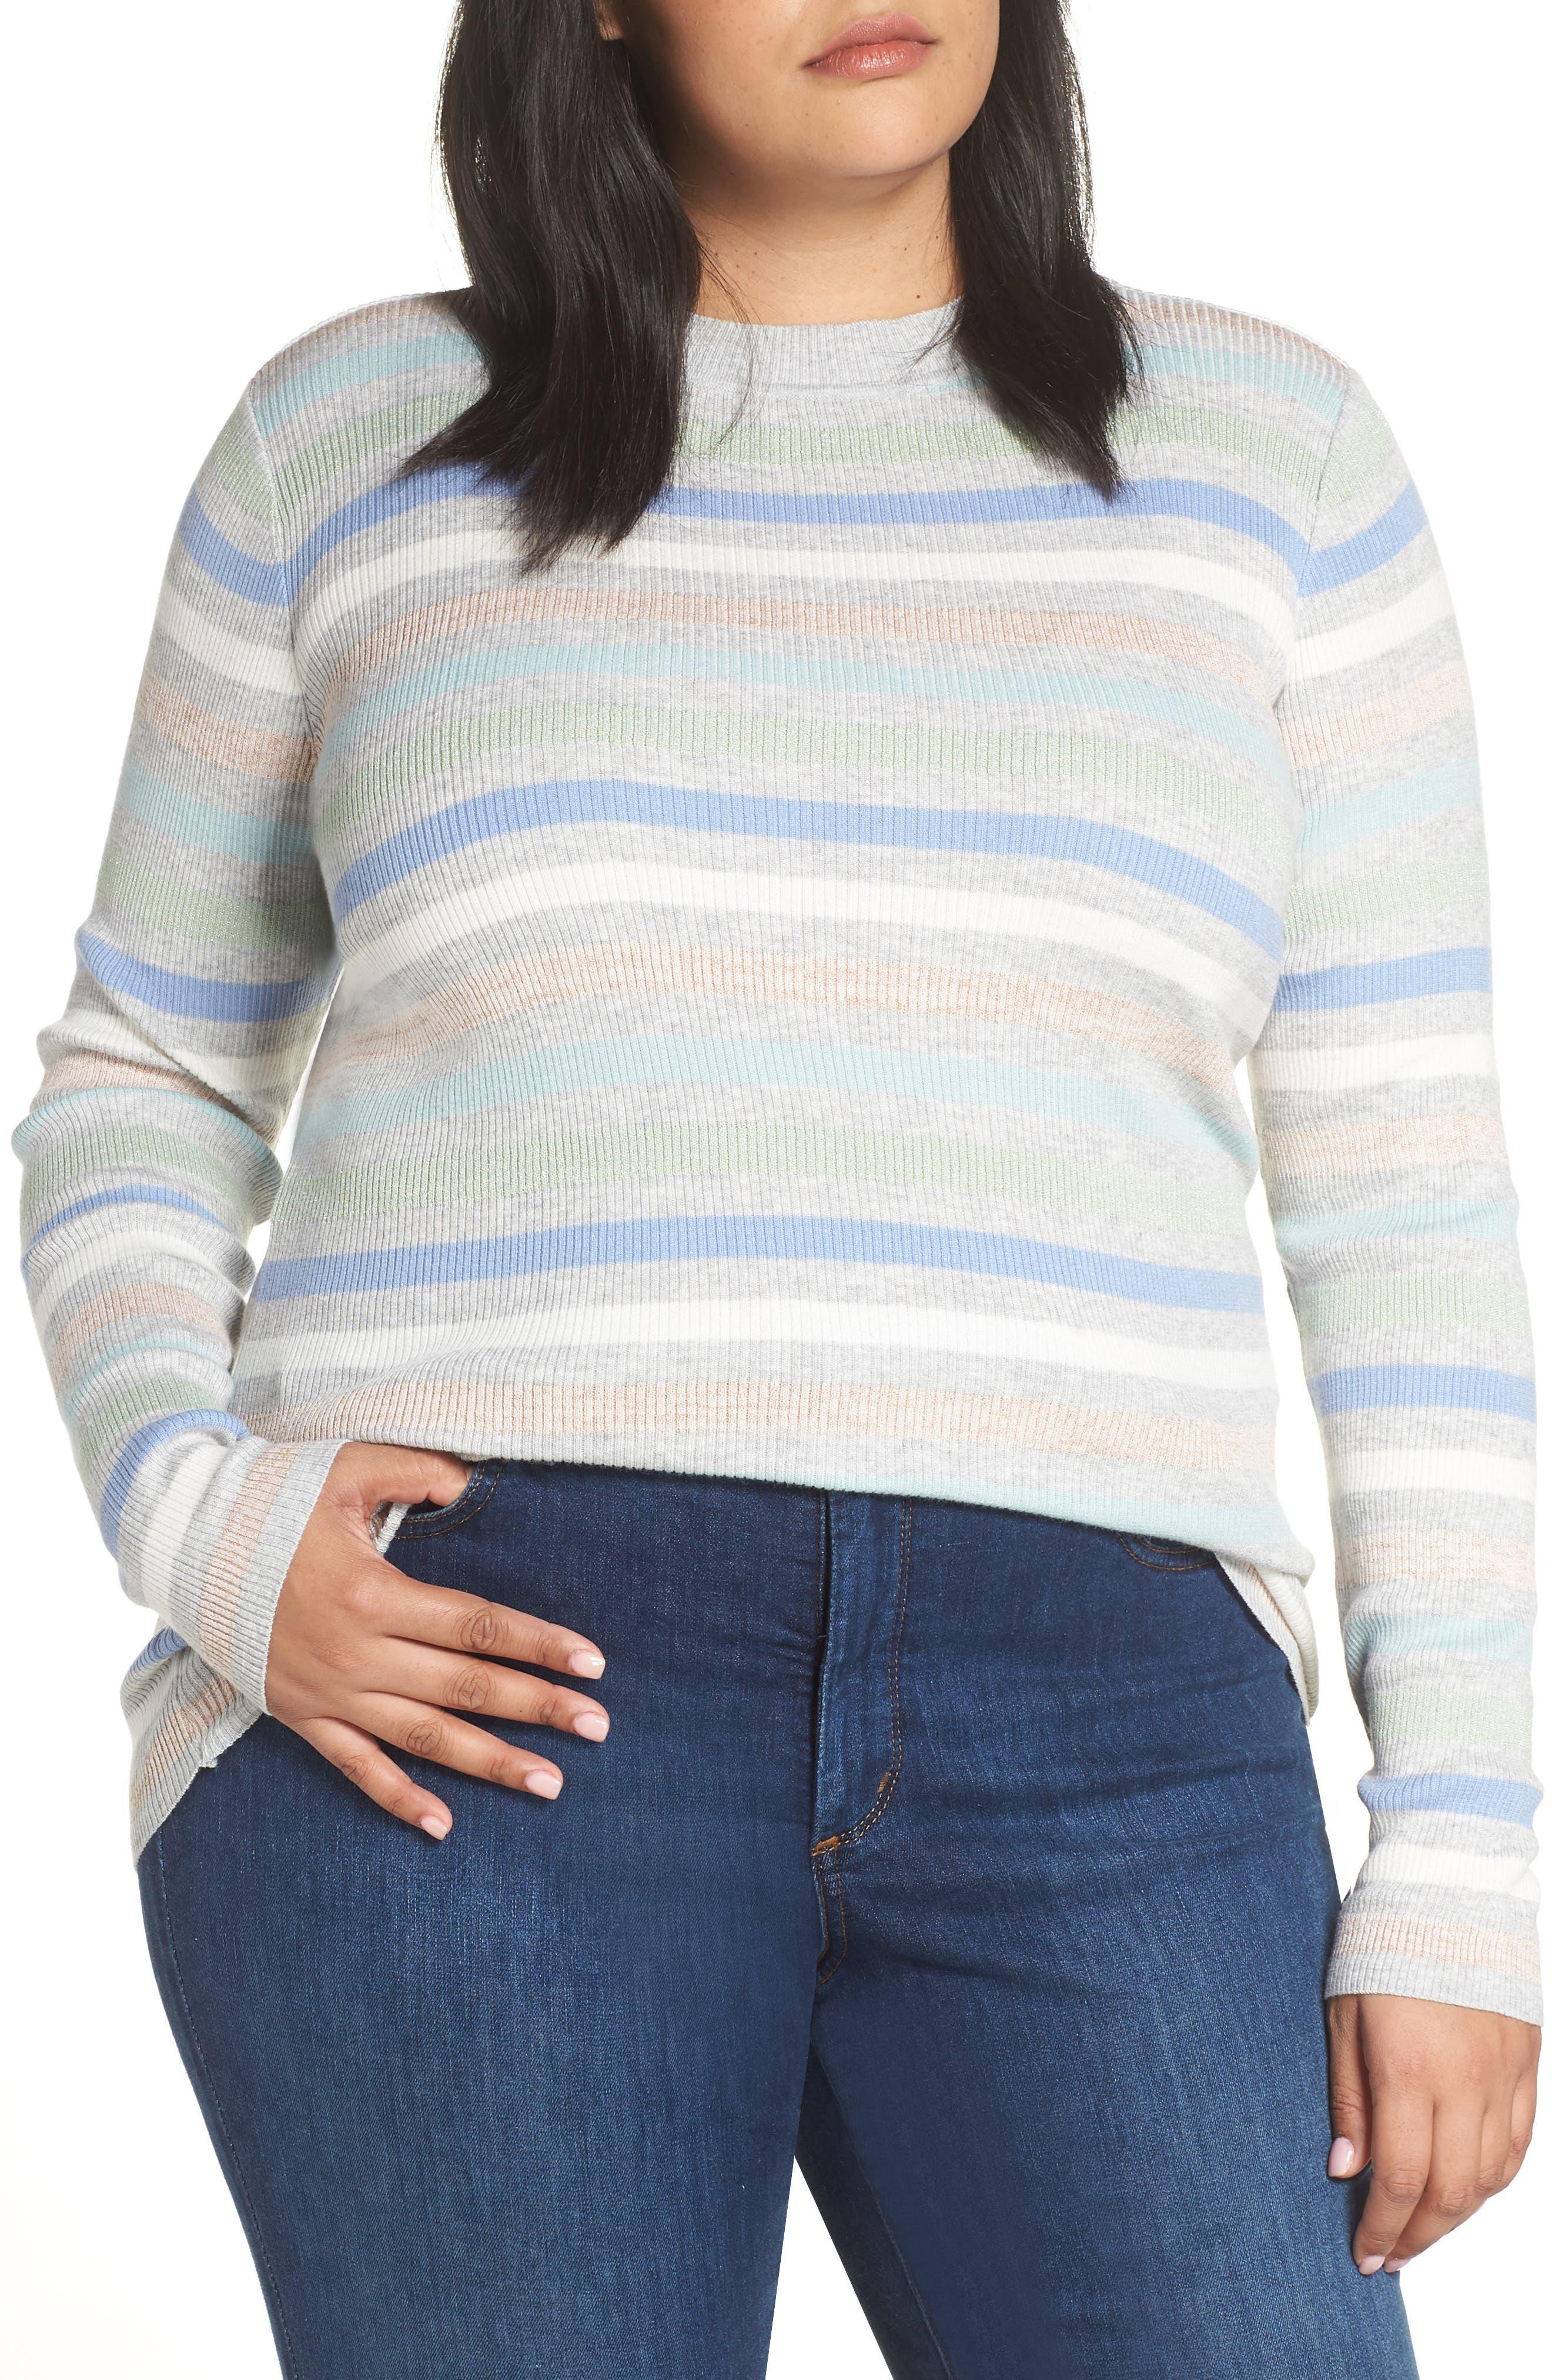 x Atlantic-Pacific Shimmer Stripe Sweater,                         Main,                         color, GREY MULTI STRIPE